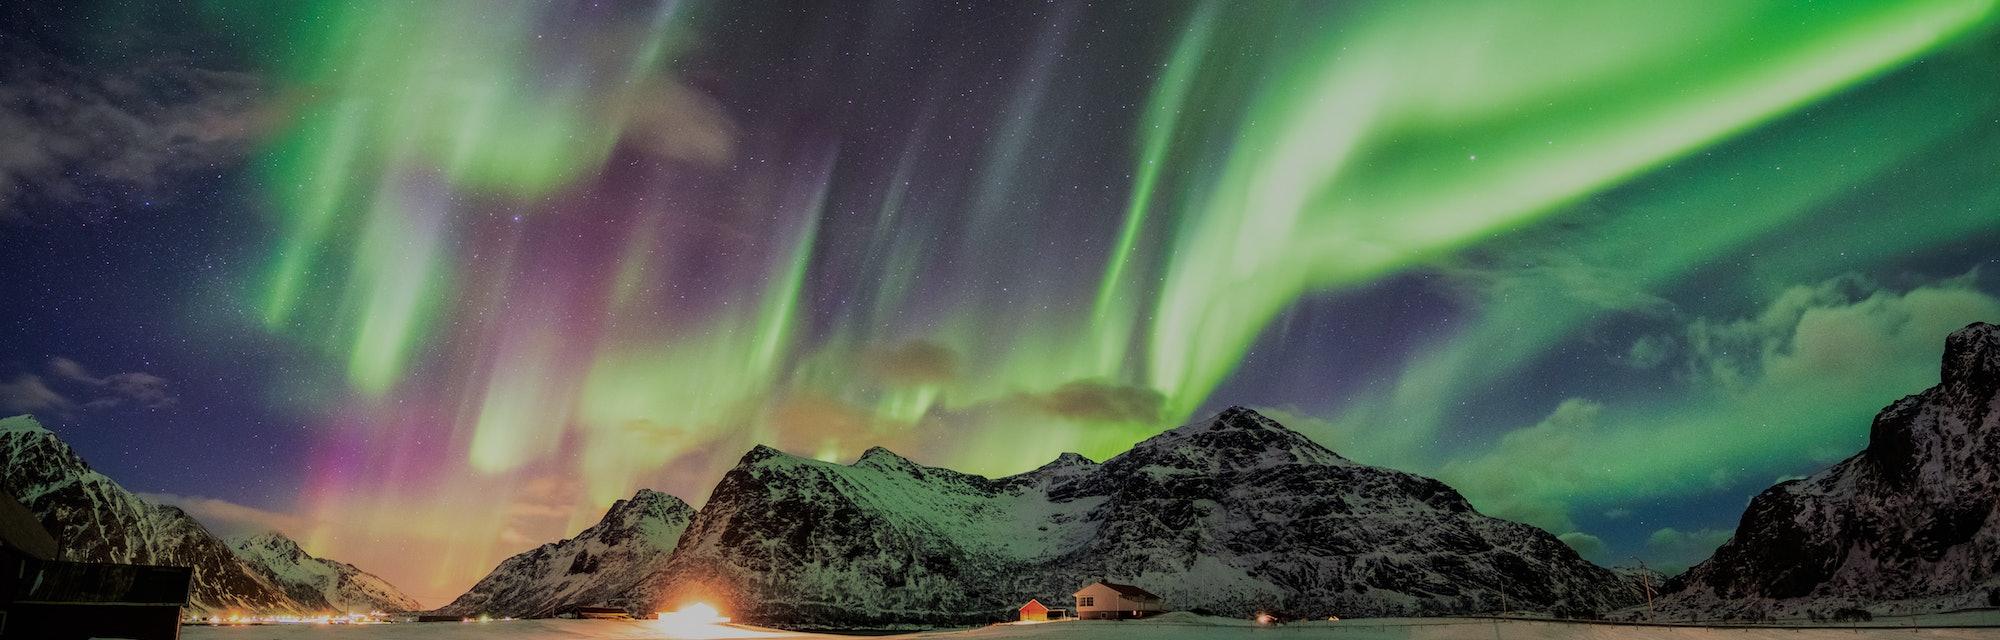 Aurora borealis (Northern lights) over mountain with one person at Skagsanden beach, Lofoten islands...